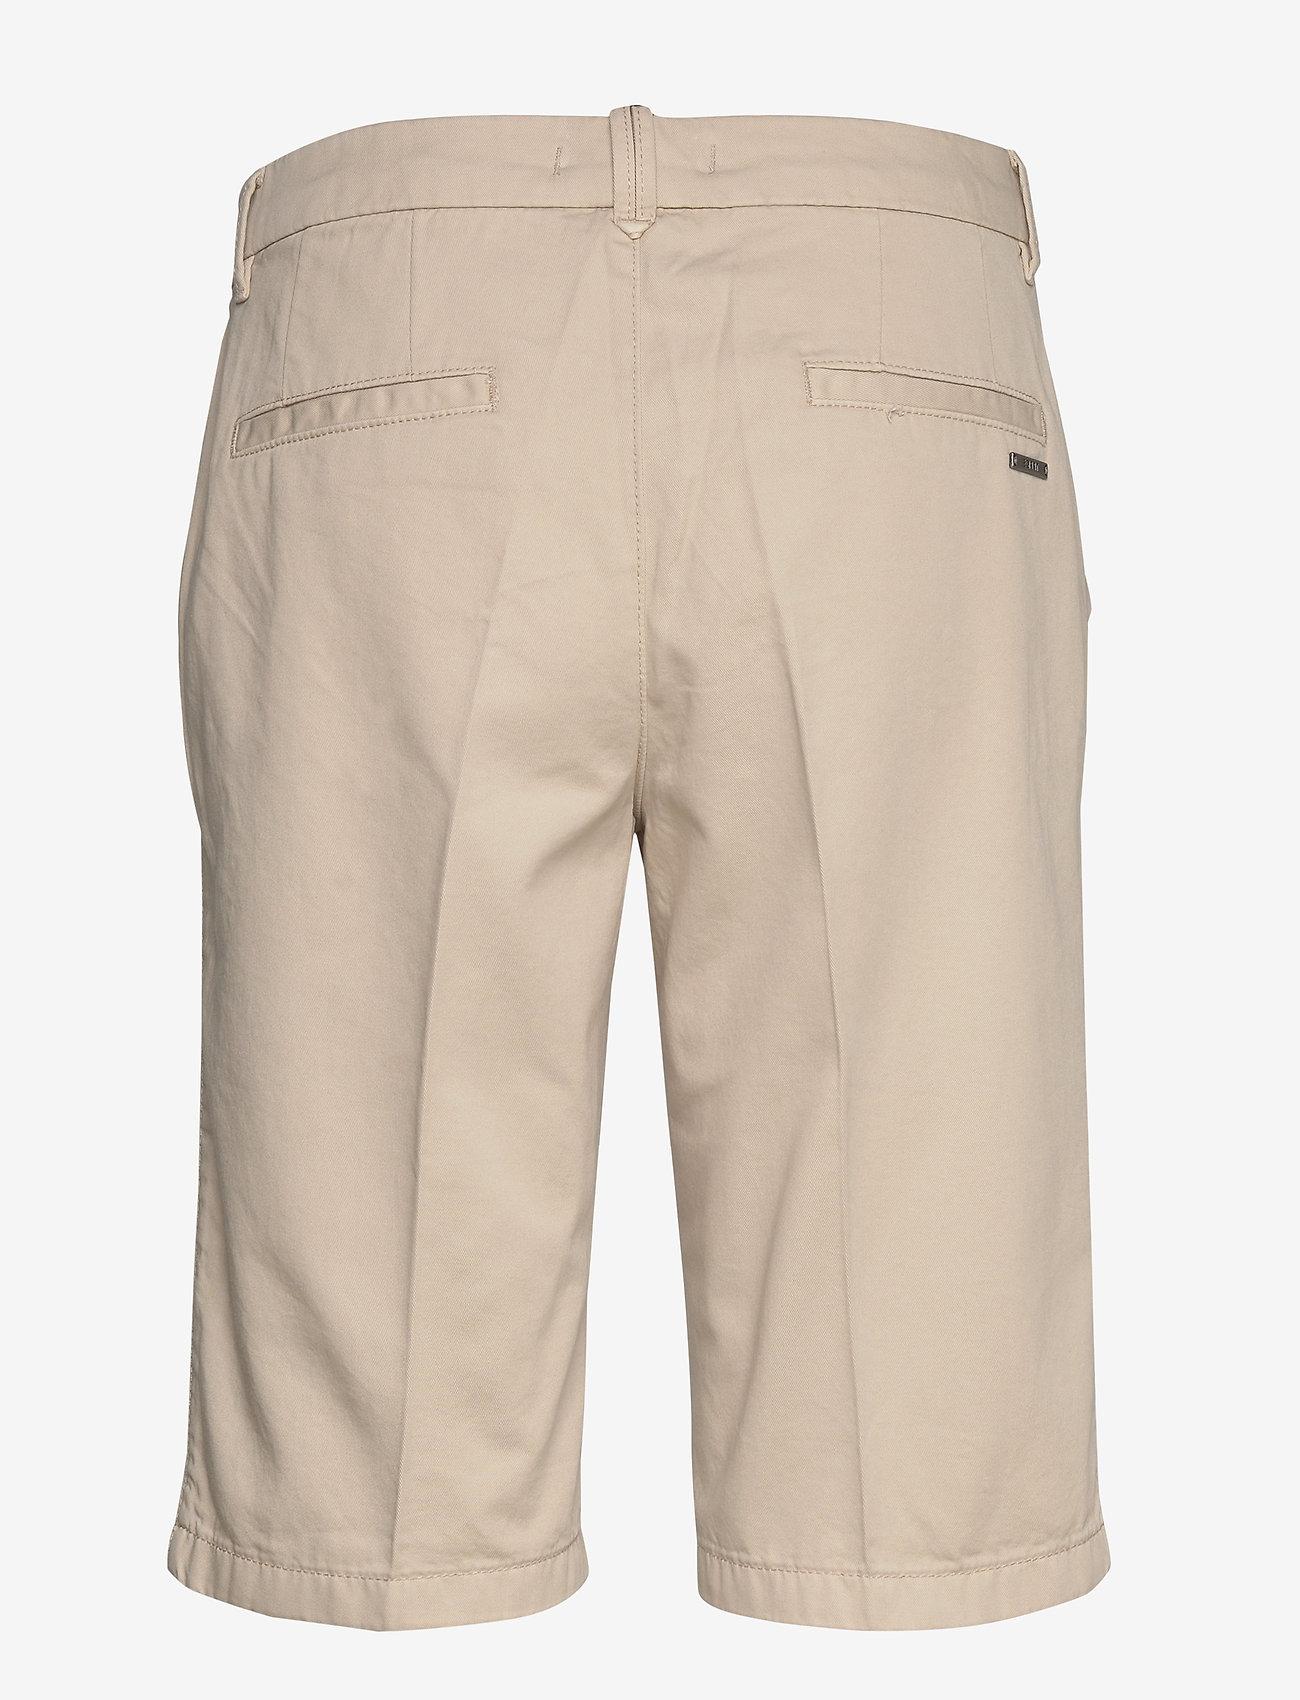 Esprit Casual - Shorts woven - bermudashorts - sand - 1